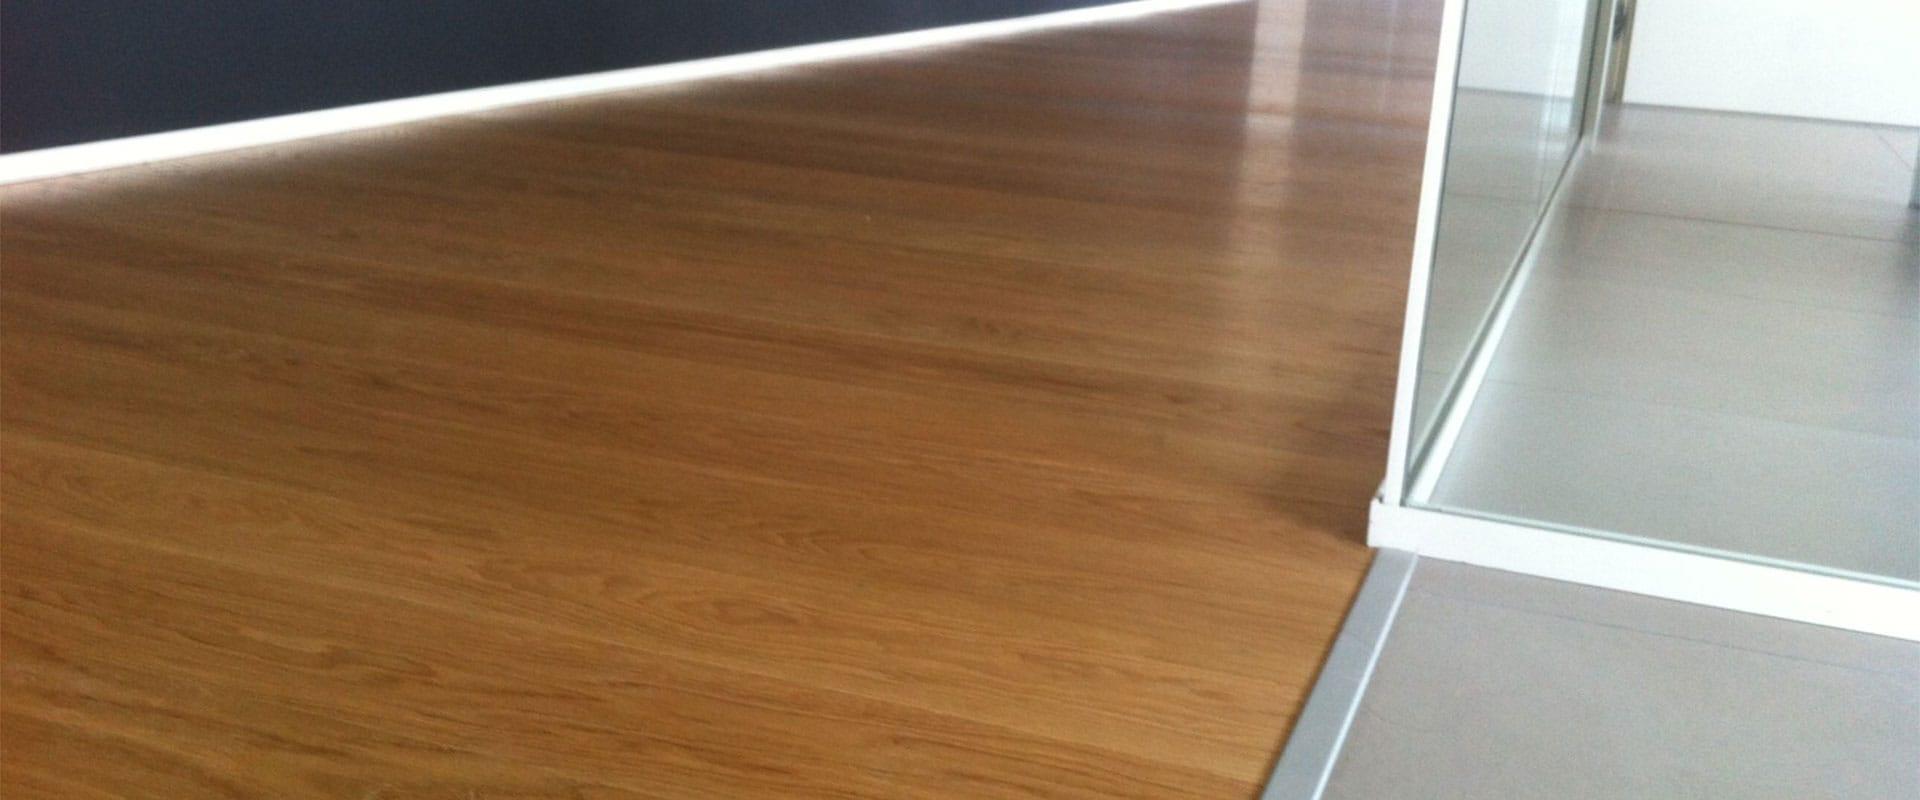 Metope pavimenti 08 metope superfici e finiture d 39 arredo - Arredo bagno montebelluna ...